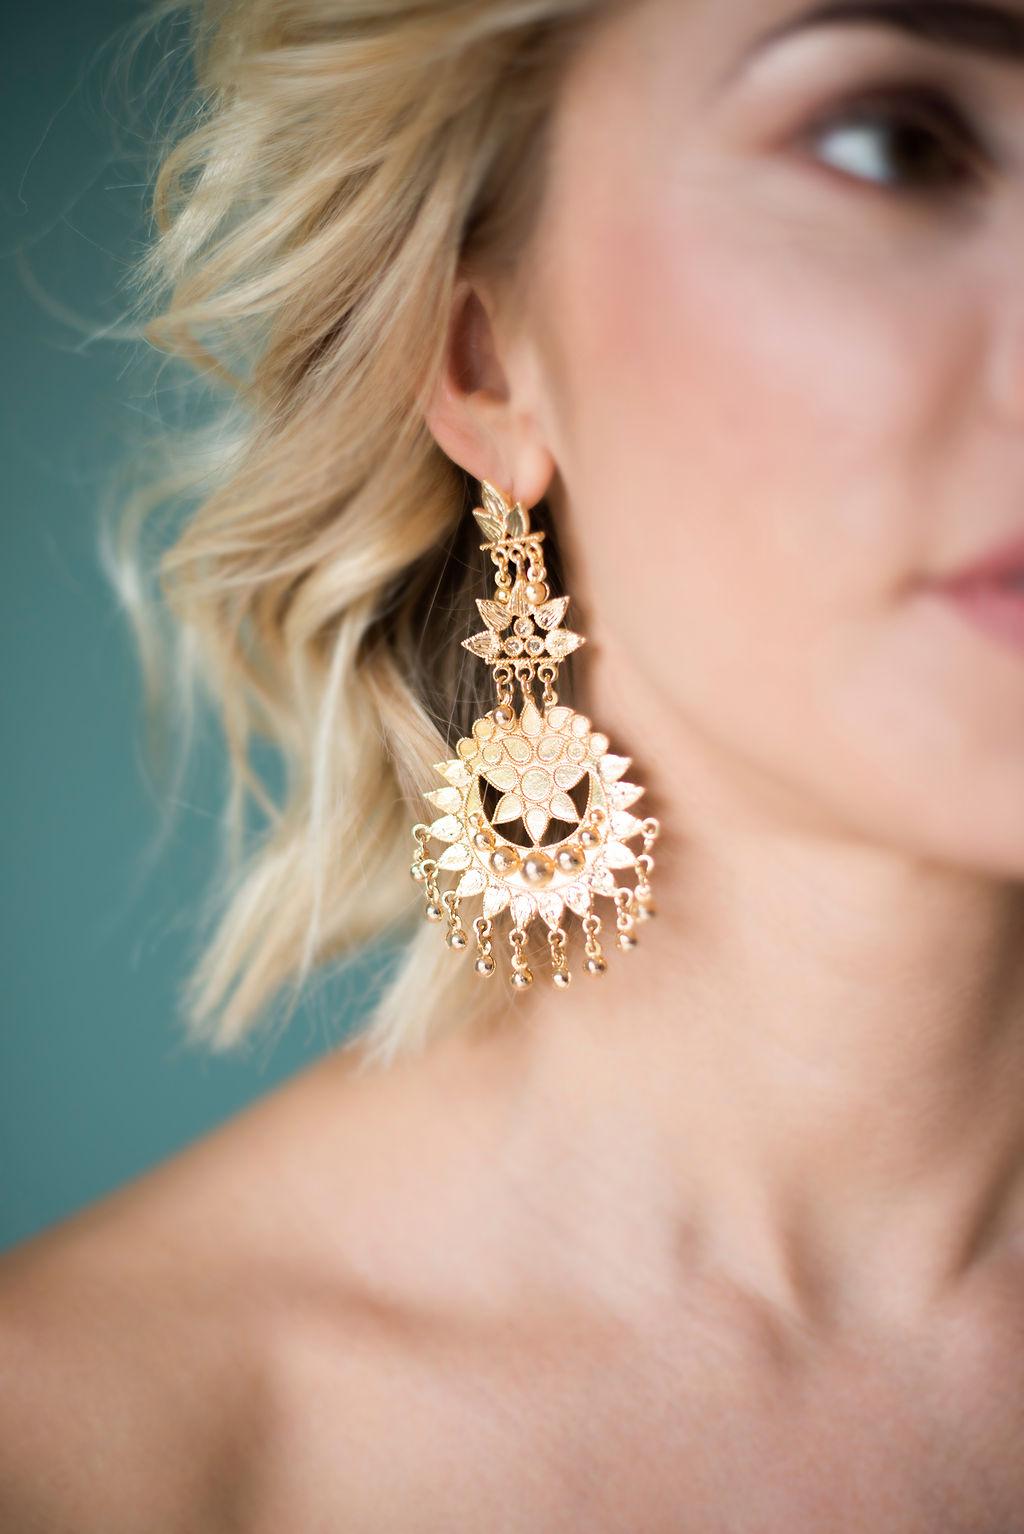 FashioneditorialSabben-Bo&luca-EmmanuelleMarty-webPhotography-5